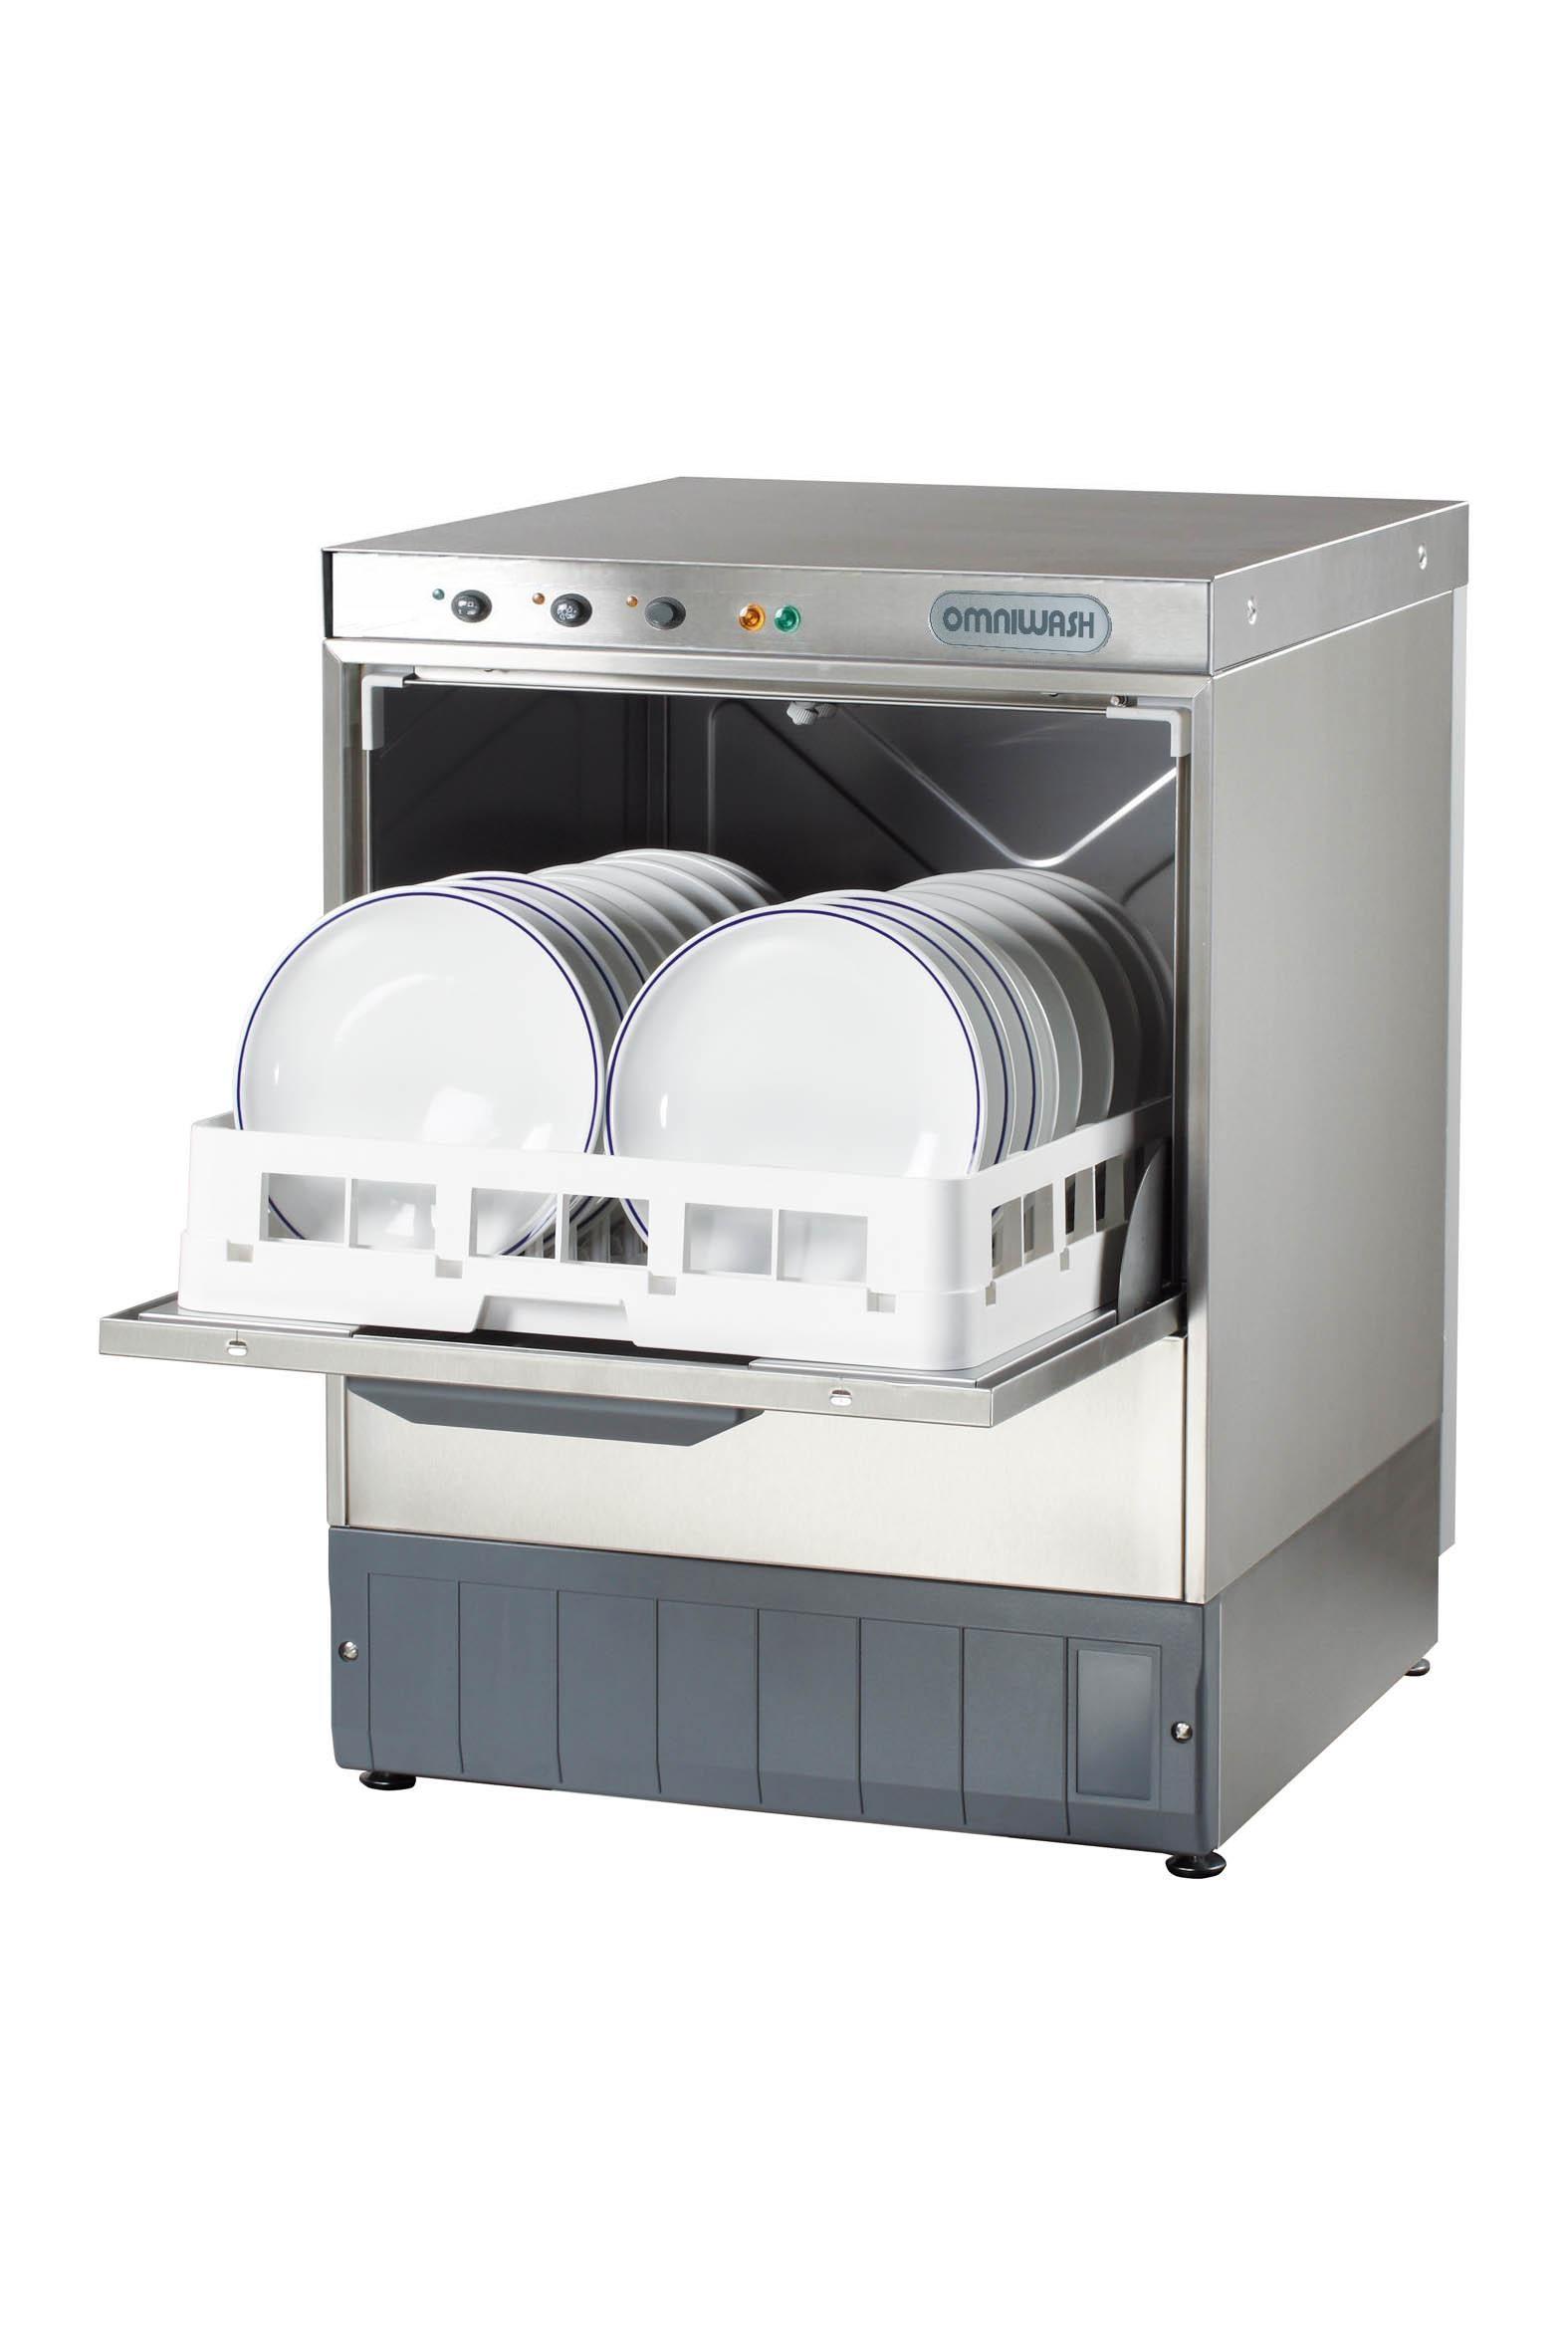 Macchine lavapiatti industriali - Omniwash